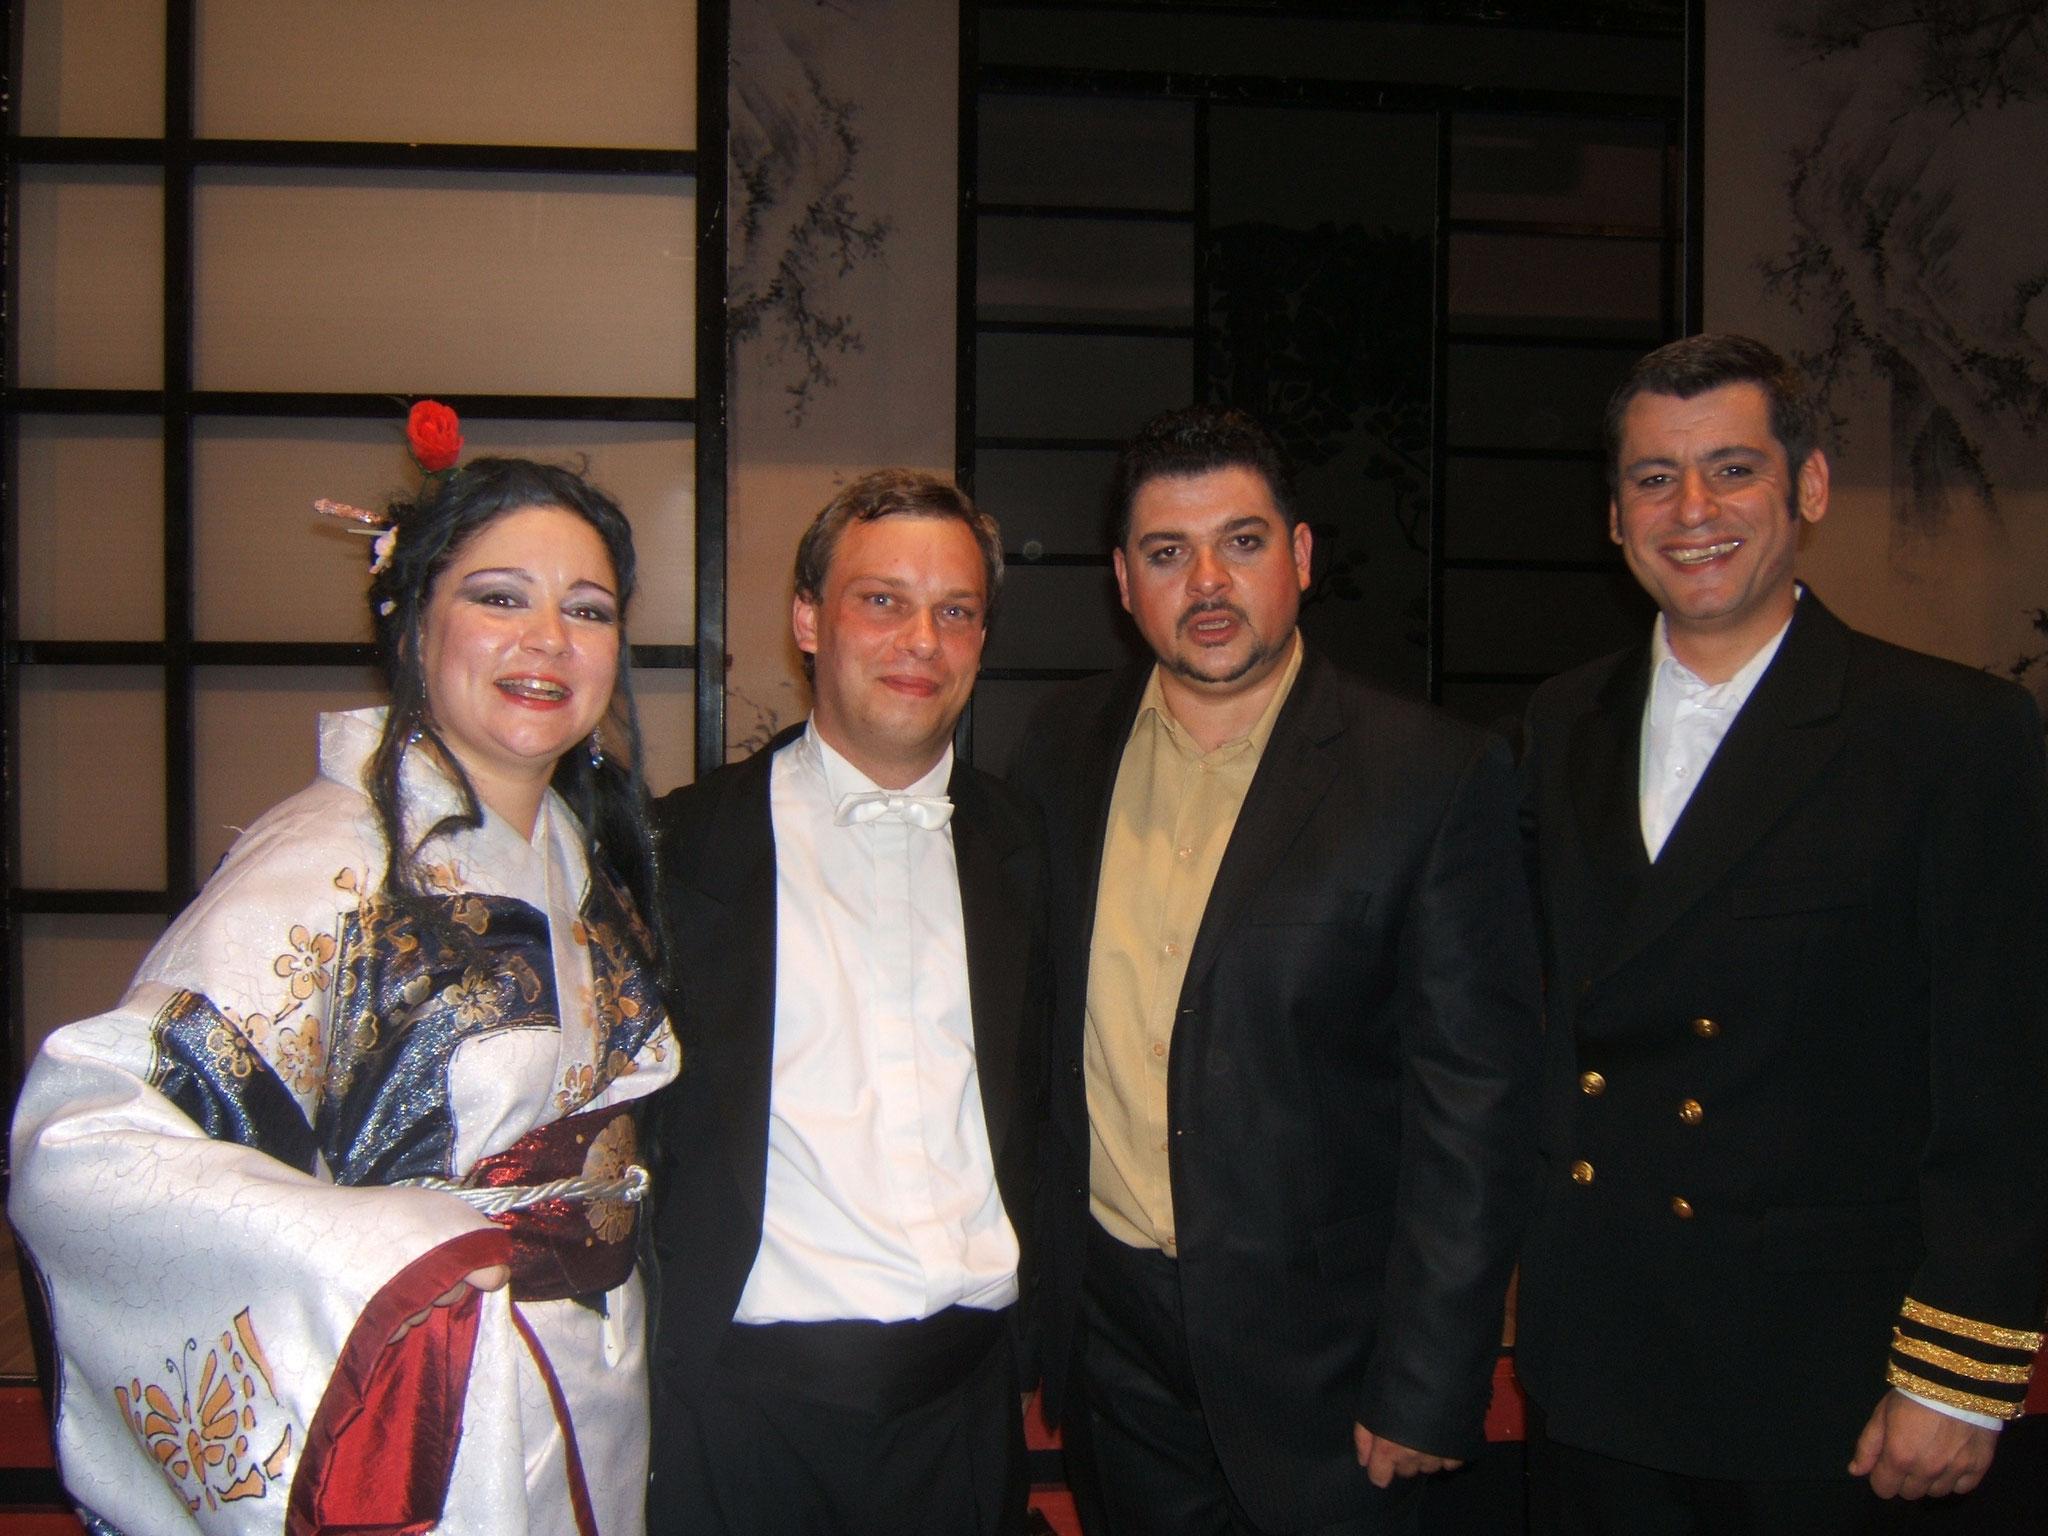 Madama Butterfly, Puccini - State Opera Burgas, Bulgaria